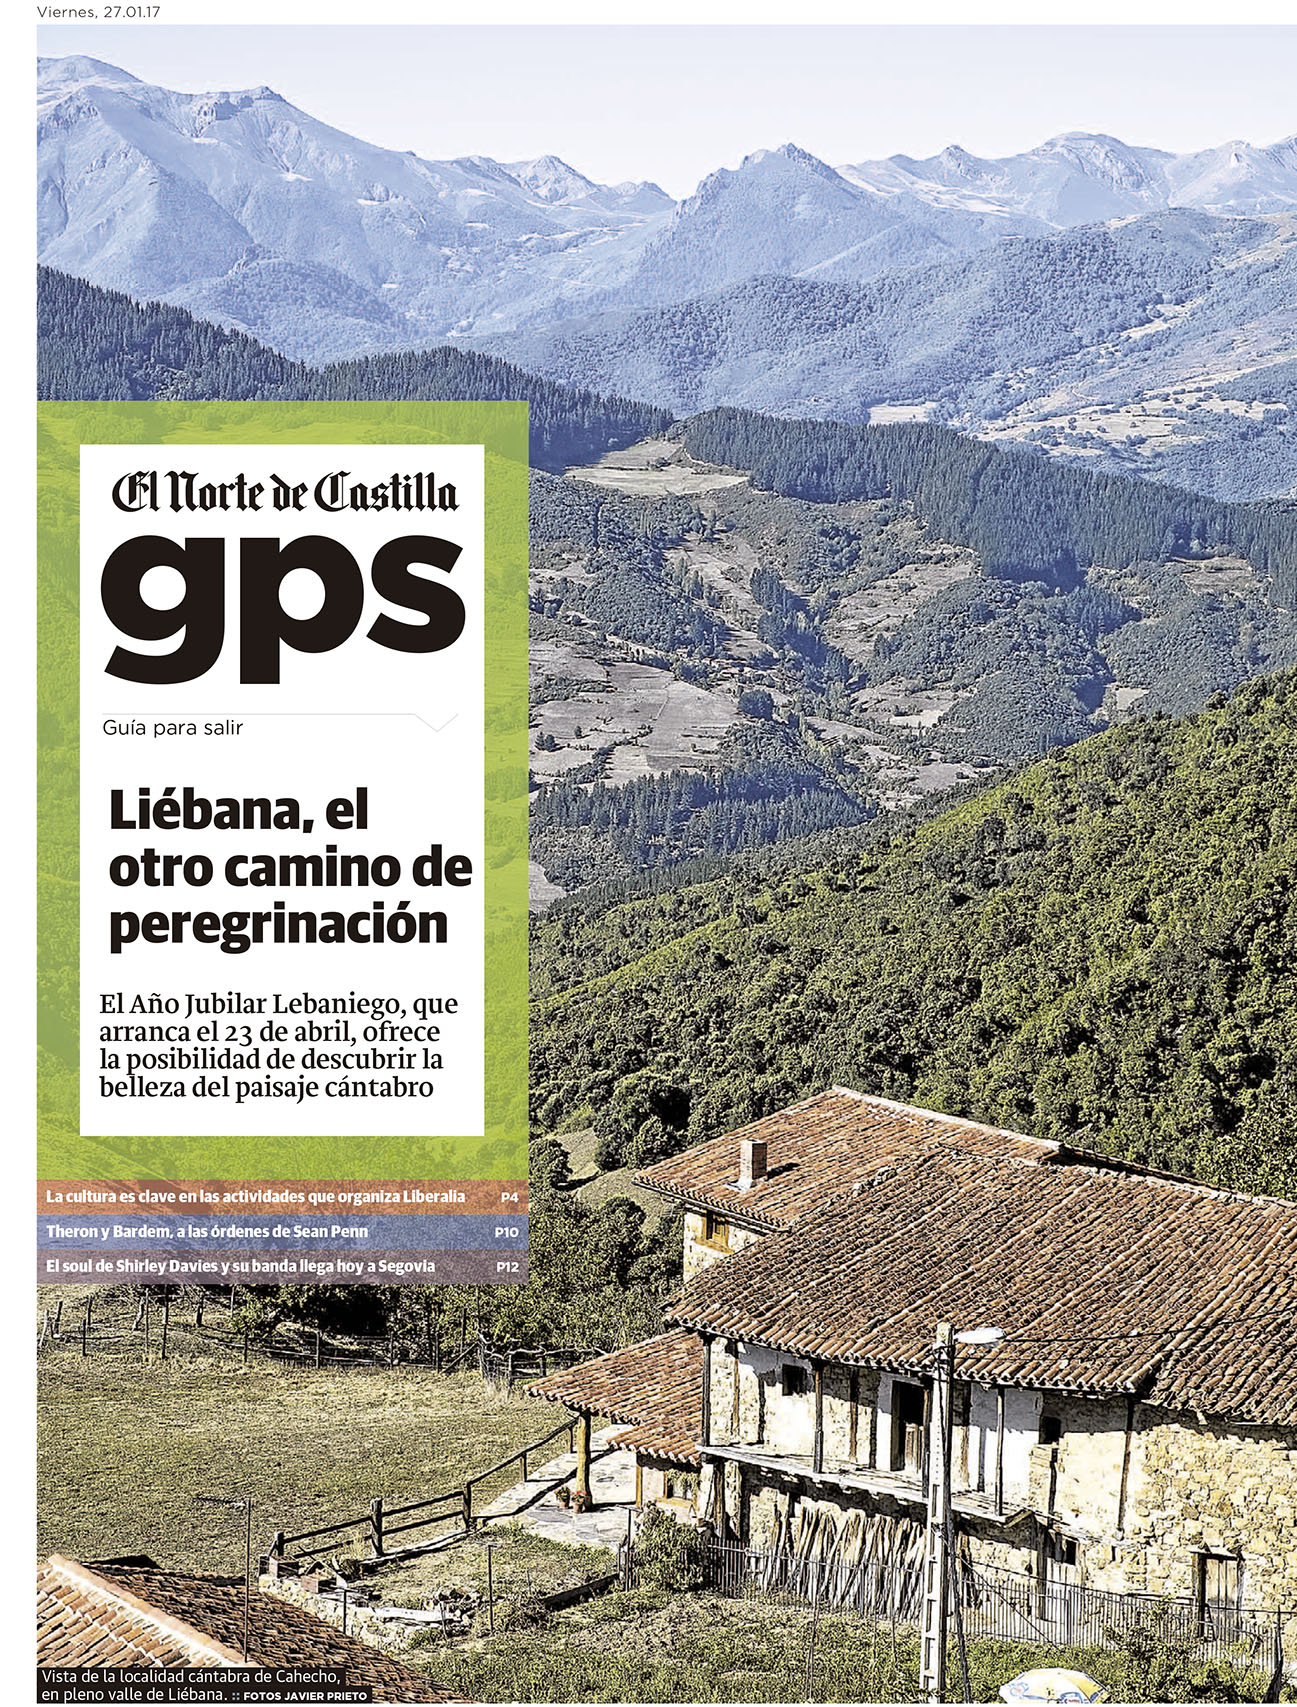 peregrinar a liébana. Reportaje de javier Prieto Gallego